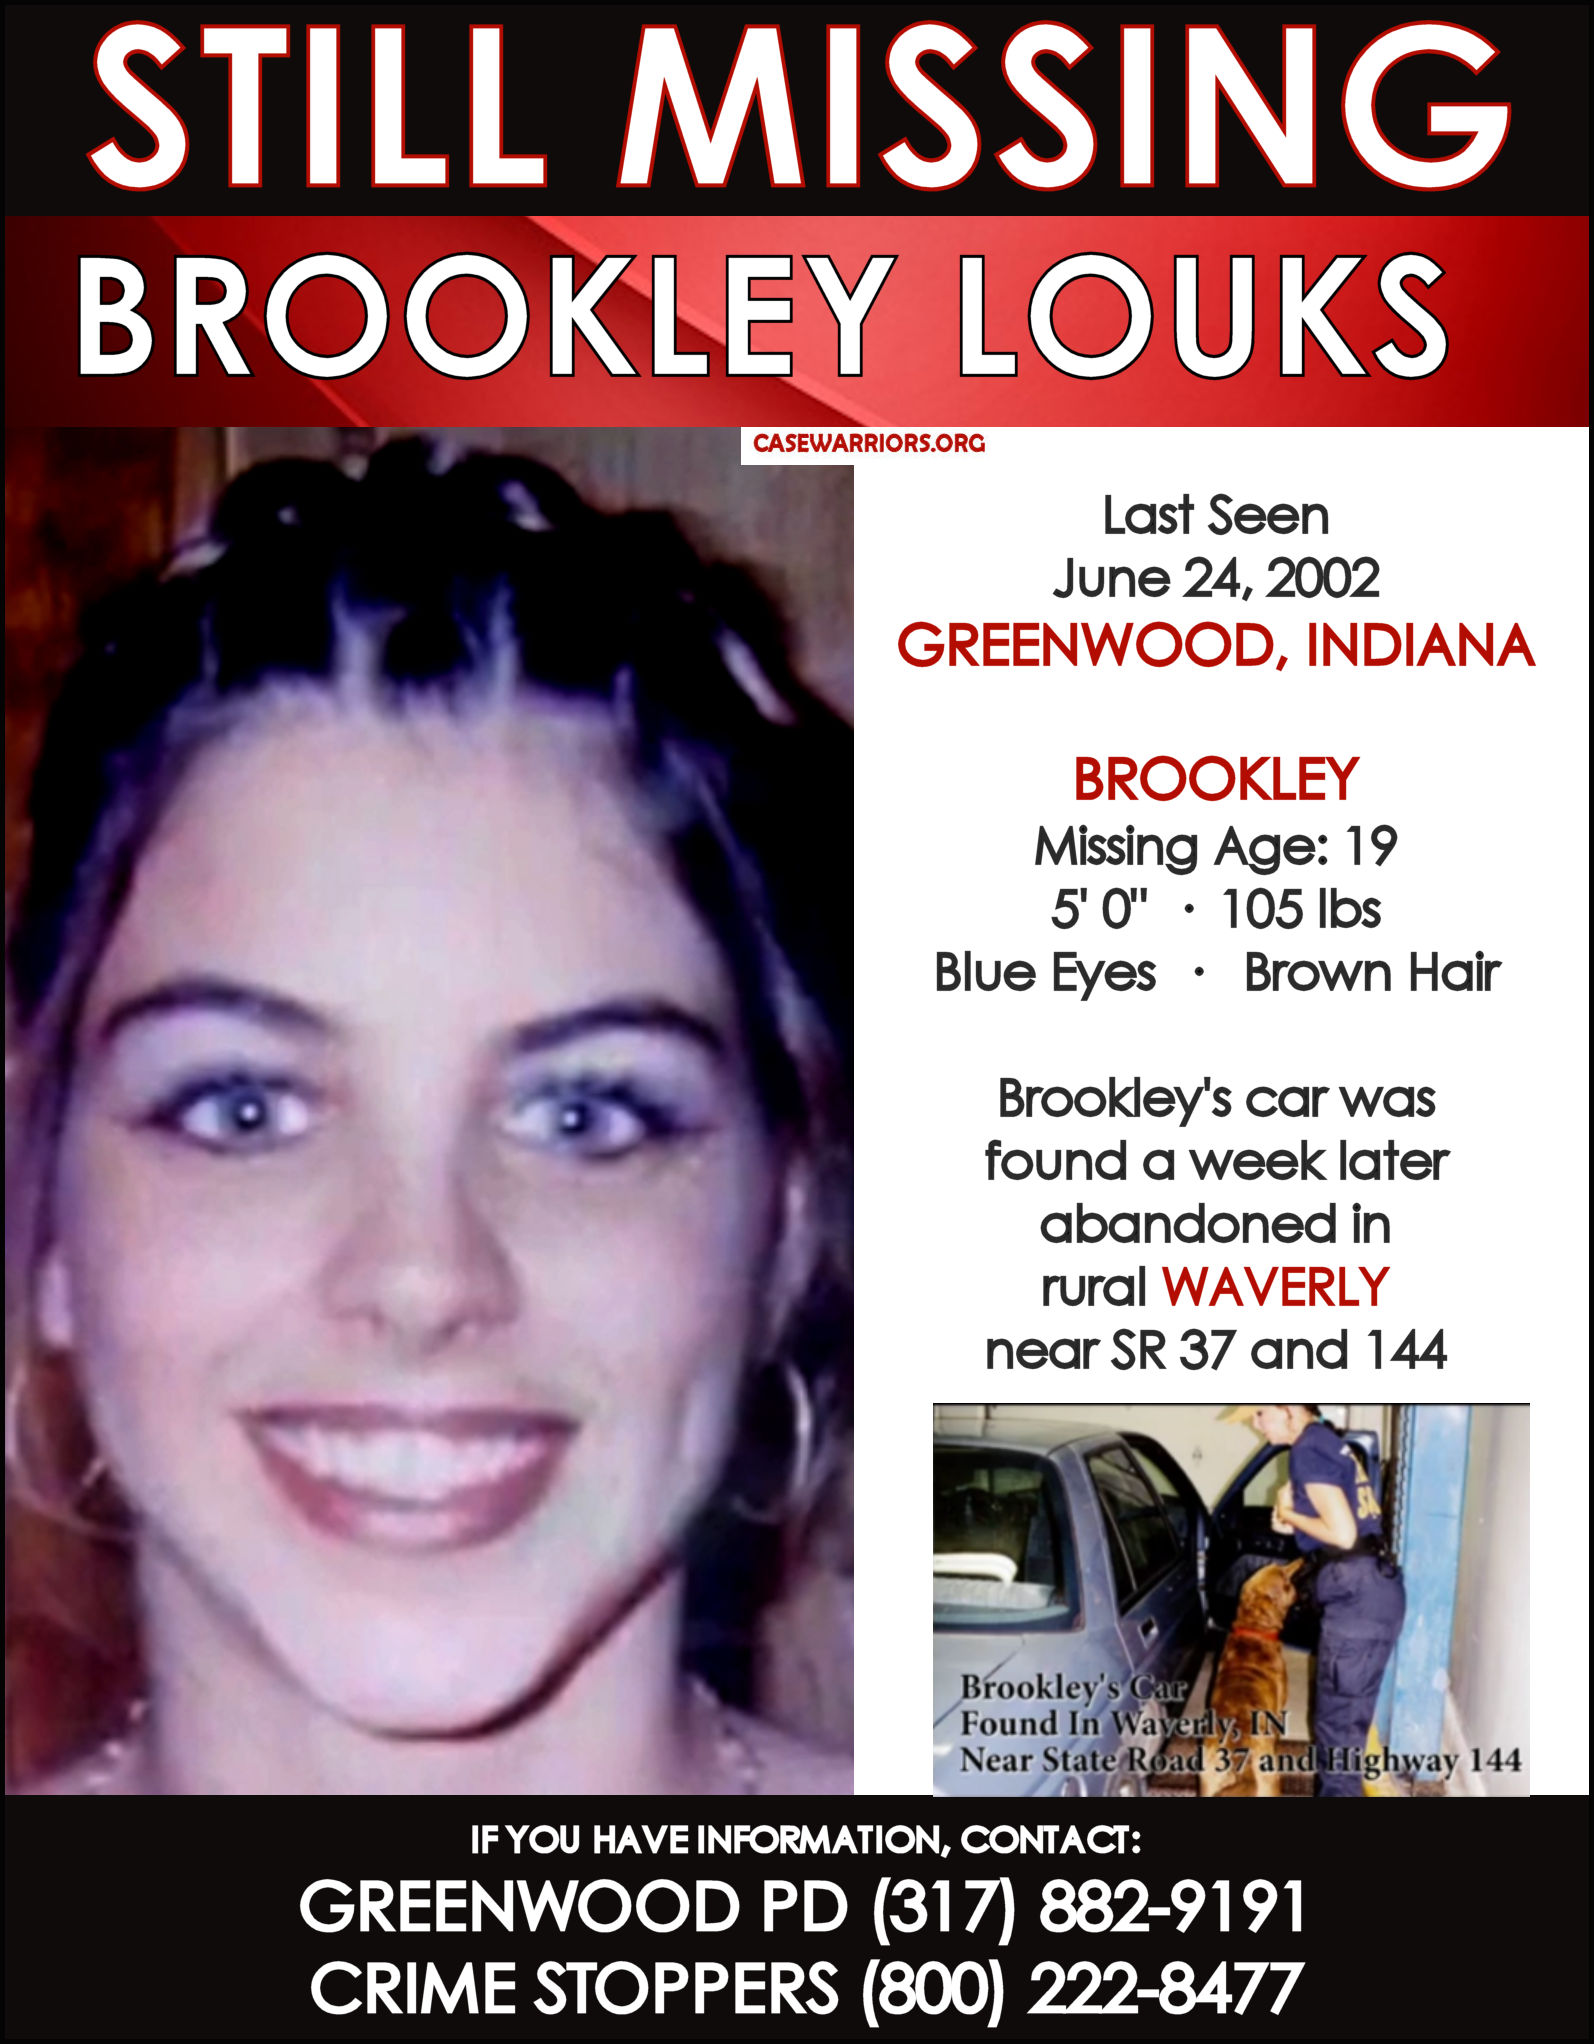 BROOKLEY LOUKS